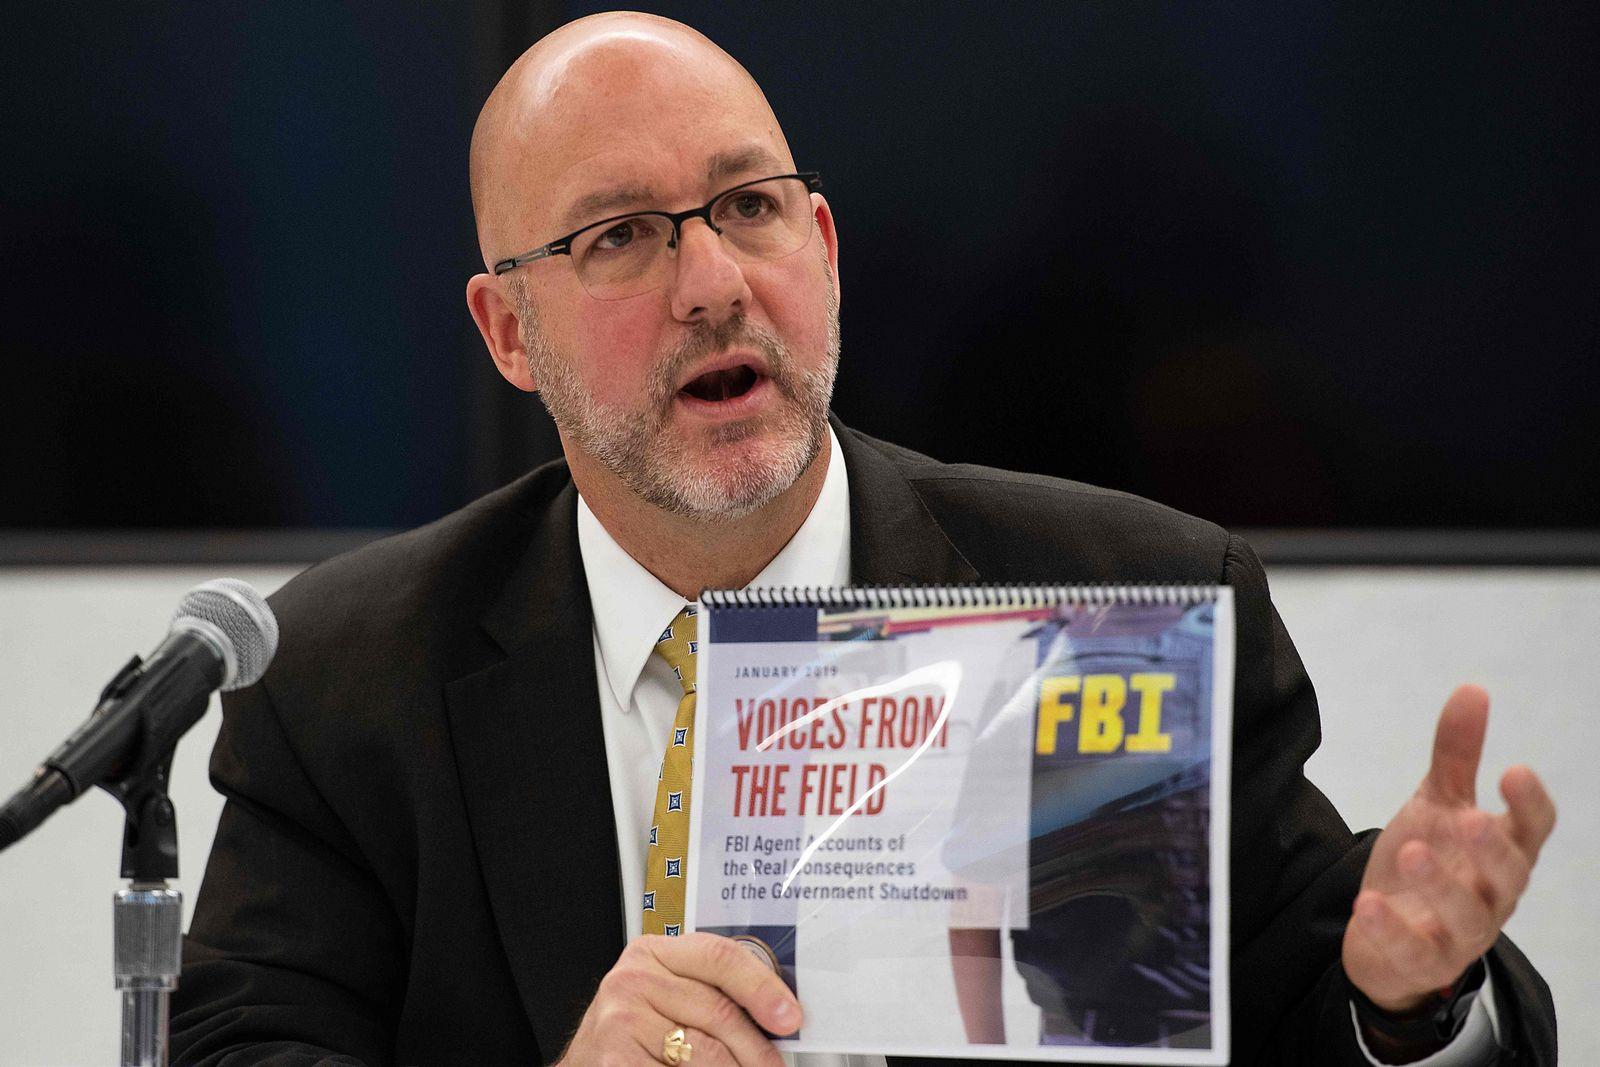 Thomas O'Connor FBI